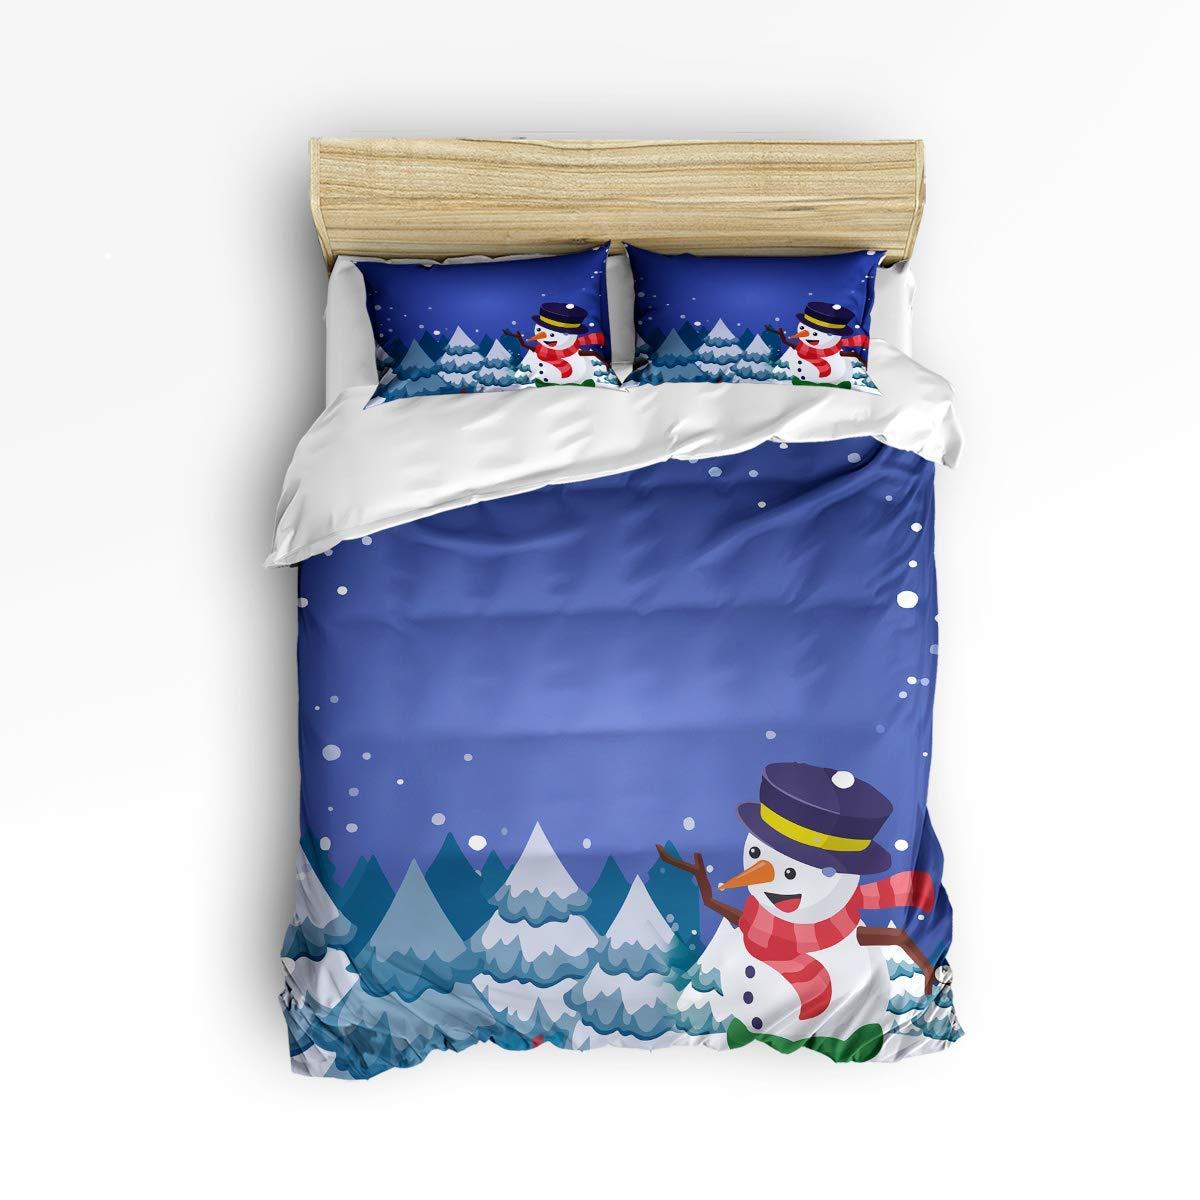 ZOMOY 寝具3点セット クリスマス 雪だるま フォーマル 帽子 雪の中に立つ 自然の夜 3ピース 掛け布団カバーセット ベッドスプレッド デイベッド 子供/子供/ティーン/大人 King Size zly3pcsbeds-181022-SWTQ00409SJSDAZN B07QHXV9WD Hatsnowmanazn7472 King Size